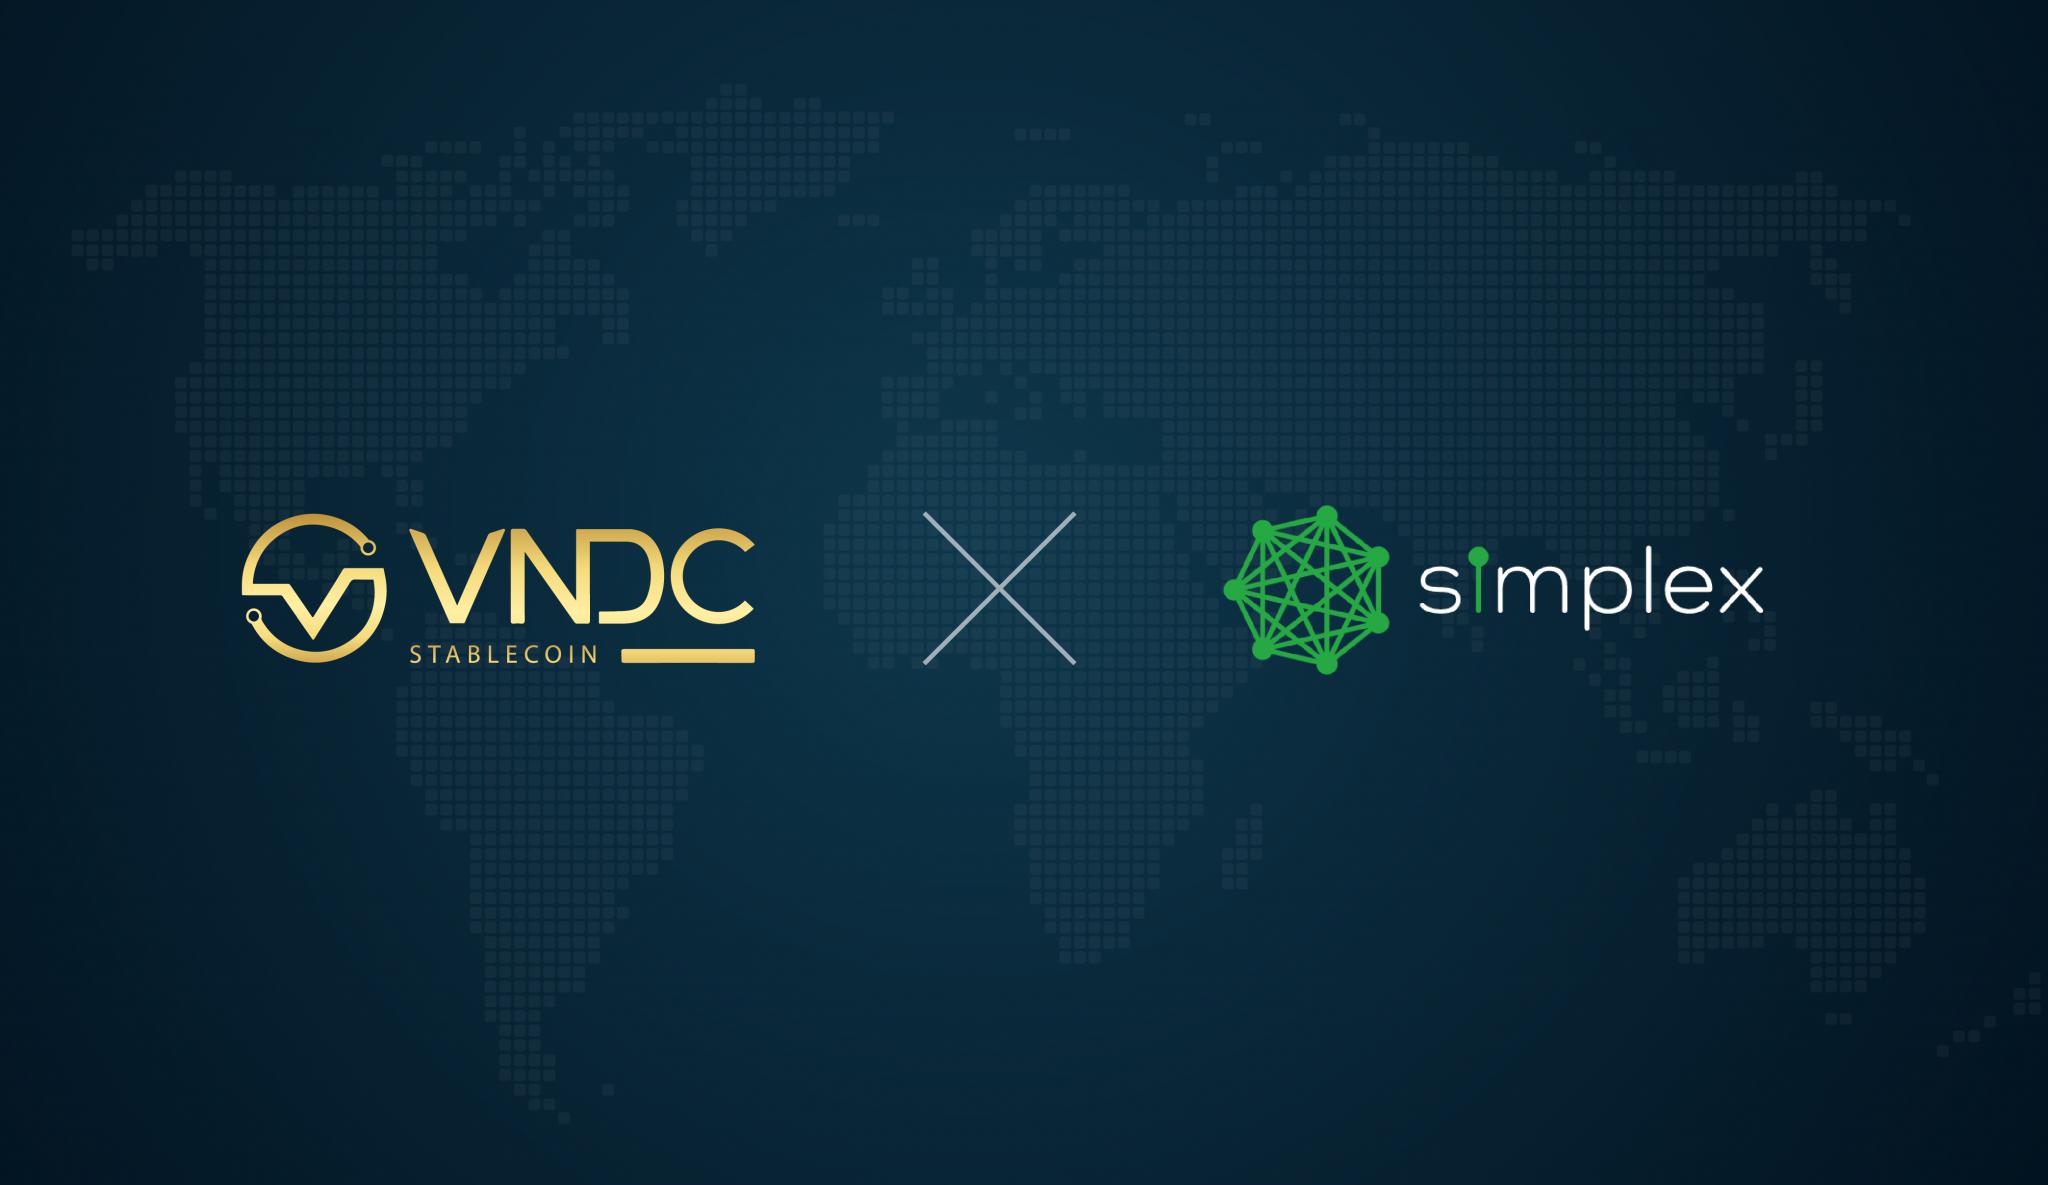 VNDC x Simplex: Buying digital assets via Credit/Debit cards